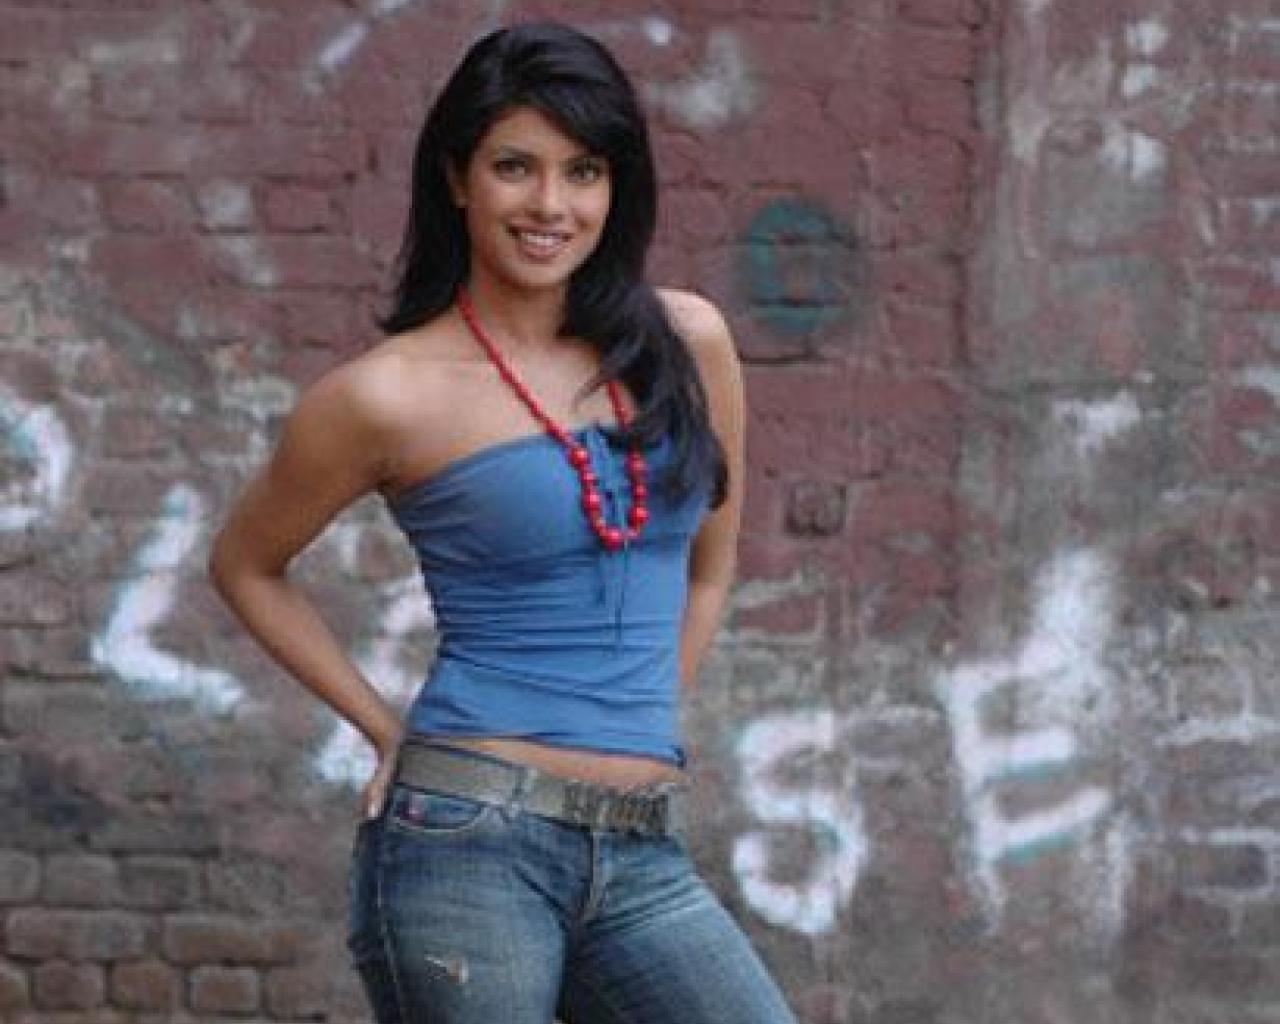 Hot Videos Priyanka-Chopra Pretty Hot Gallery-3598